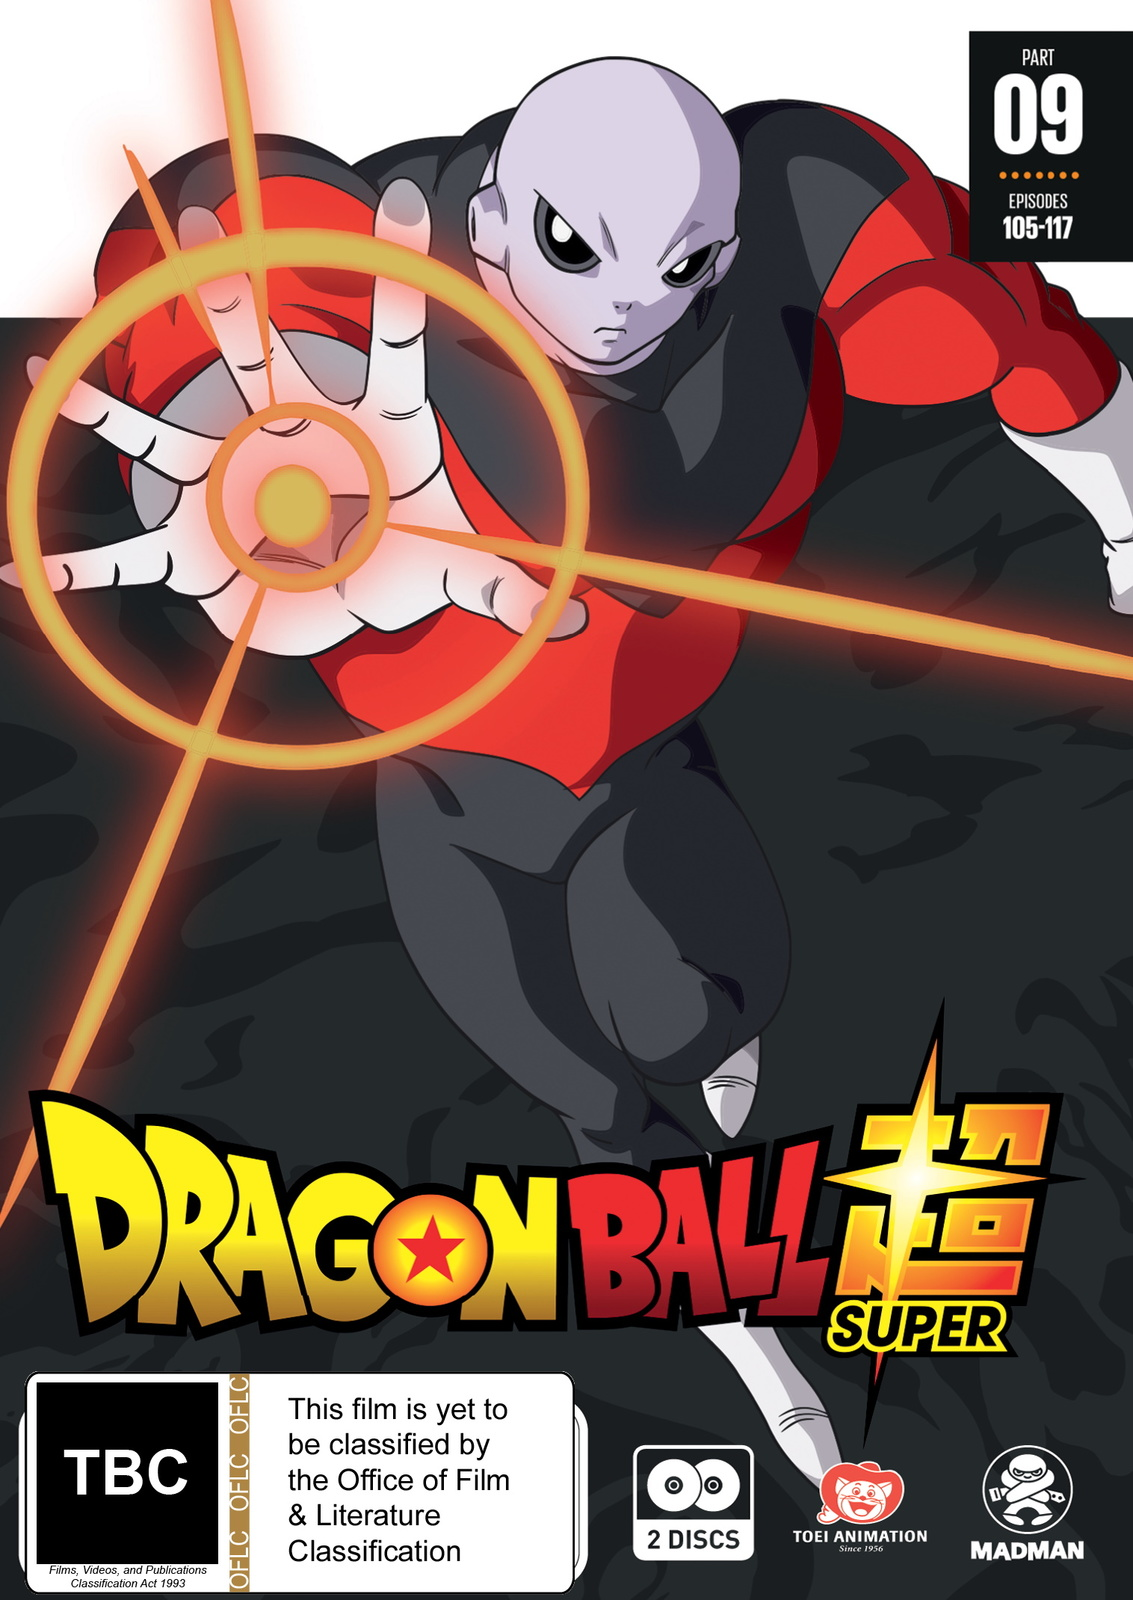 Dragon Ball Super Part 9 (Eps 105-117) on DVD image